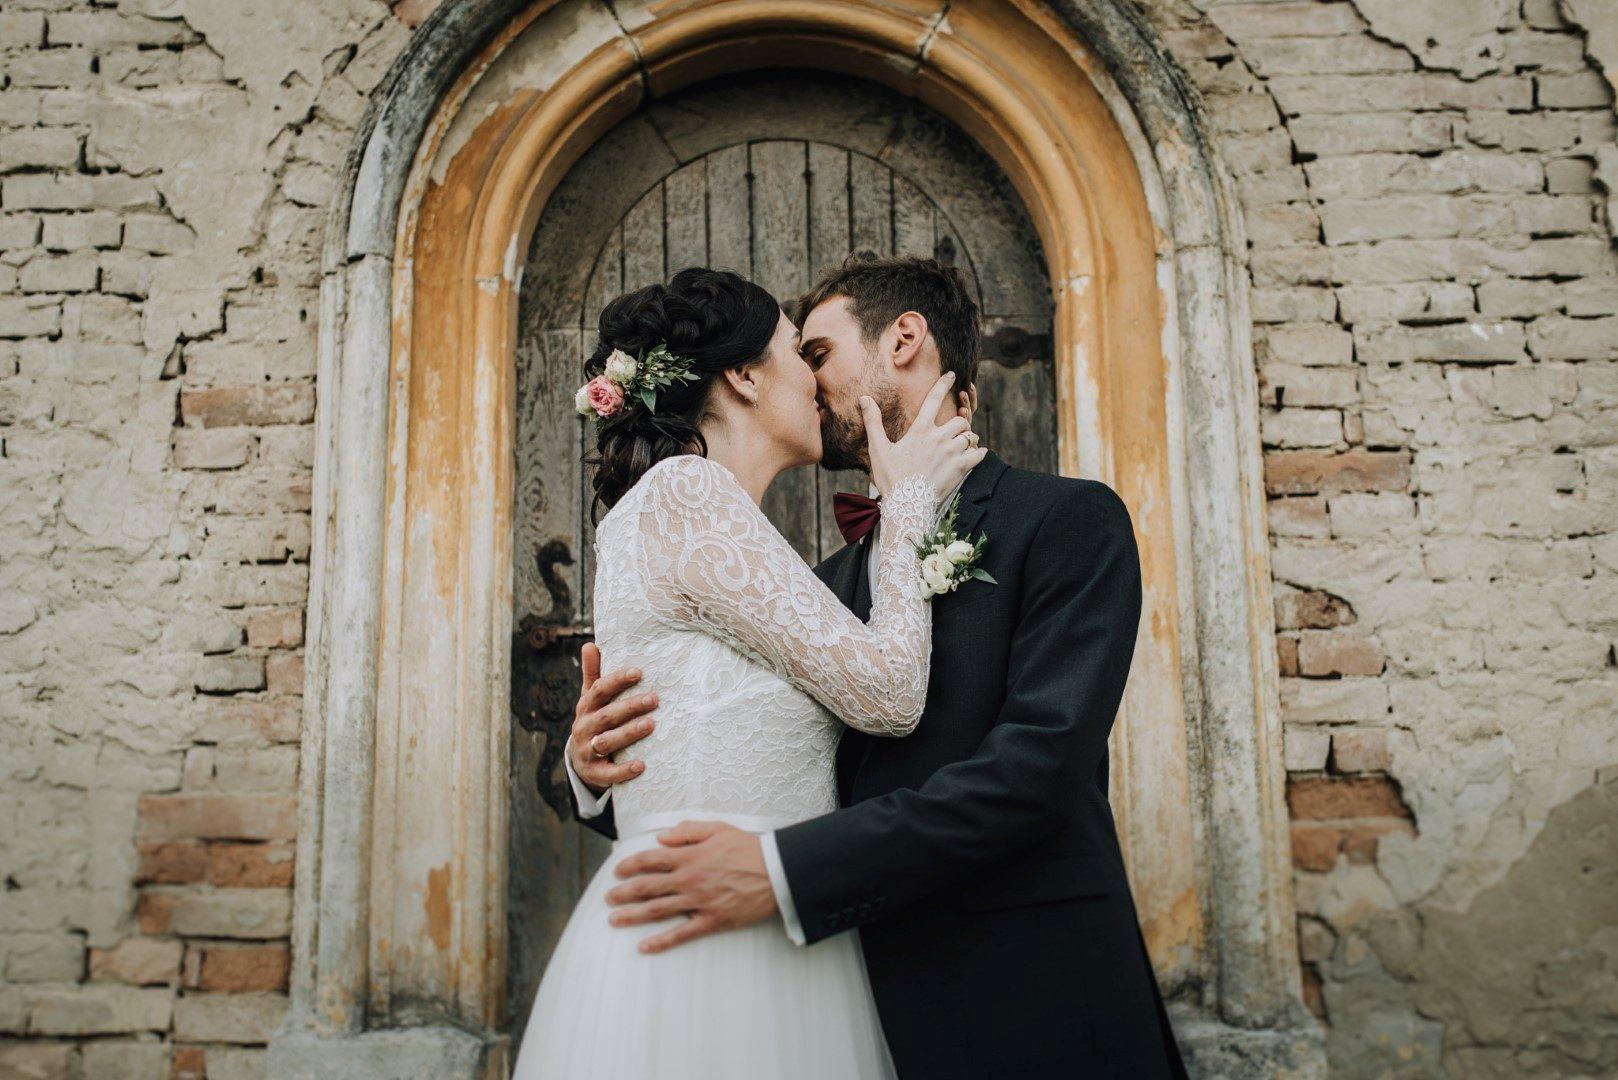 ,szabadtéri esküvő,fairy on canvas,daalarna ruha,esküvő,esküvői ruha,kápolna,esküvői inspirációk,